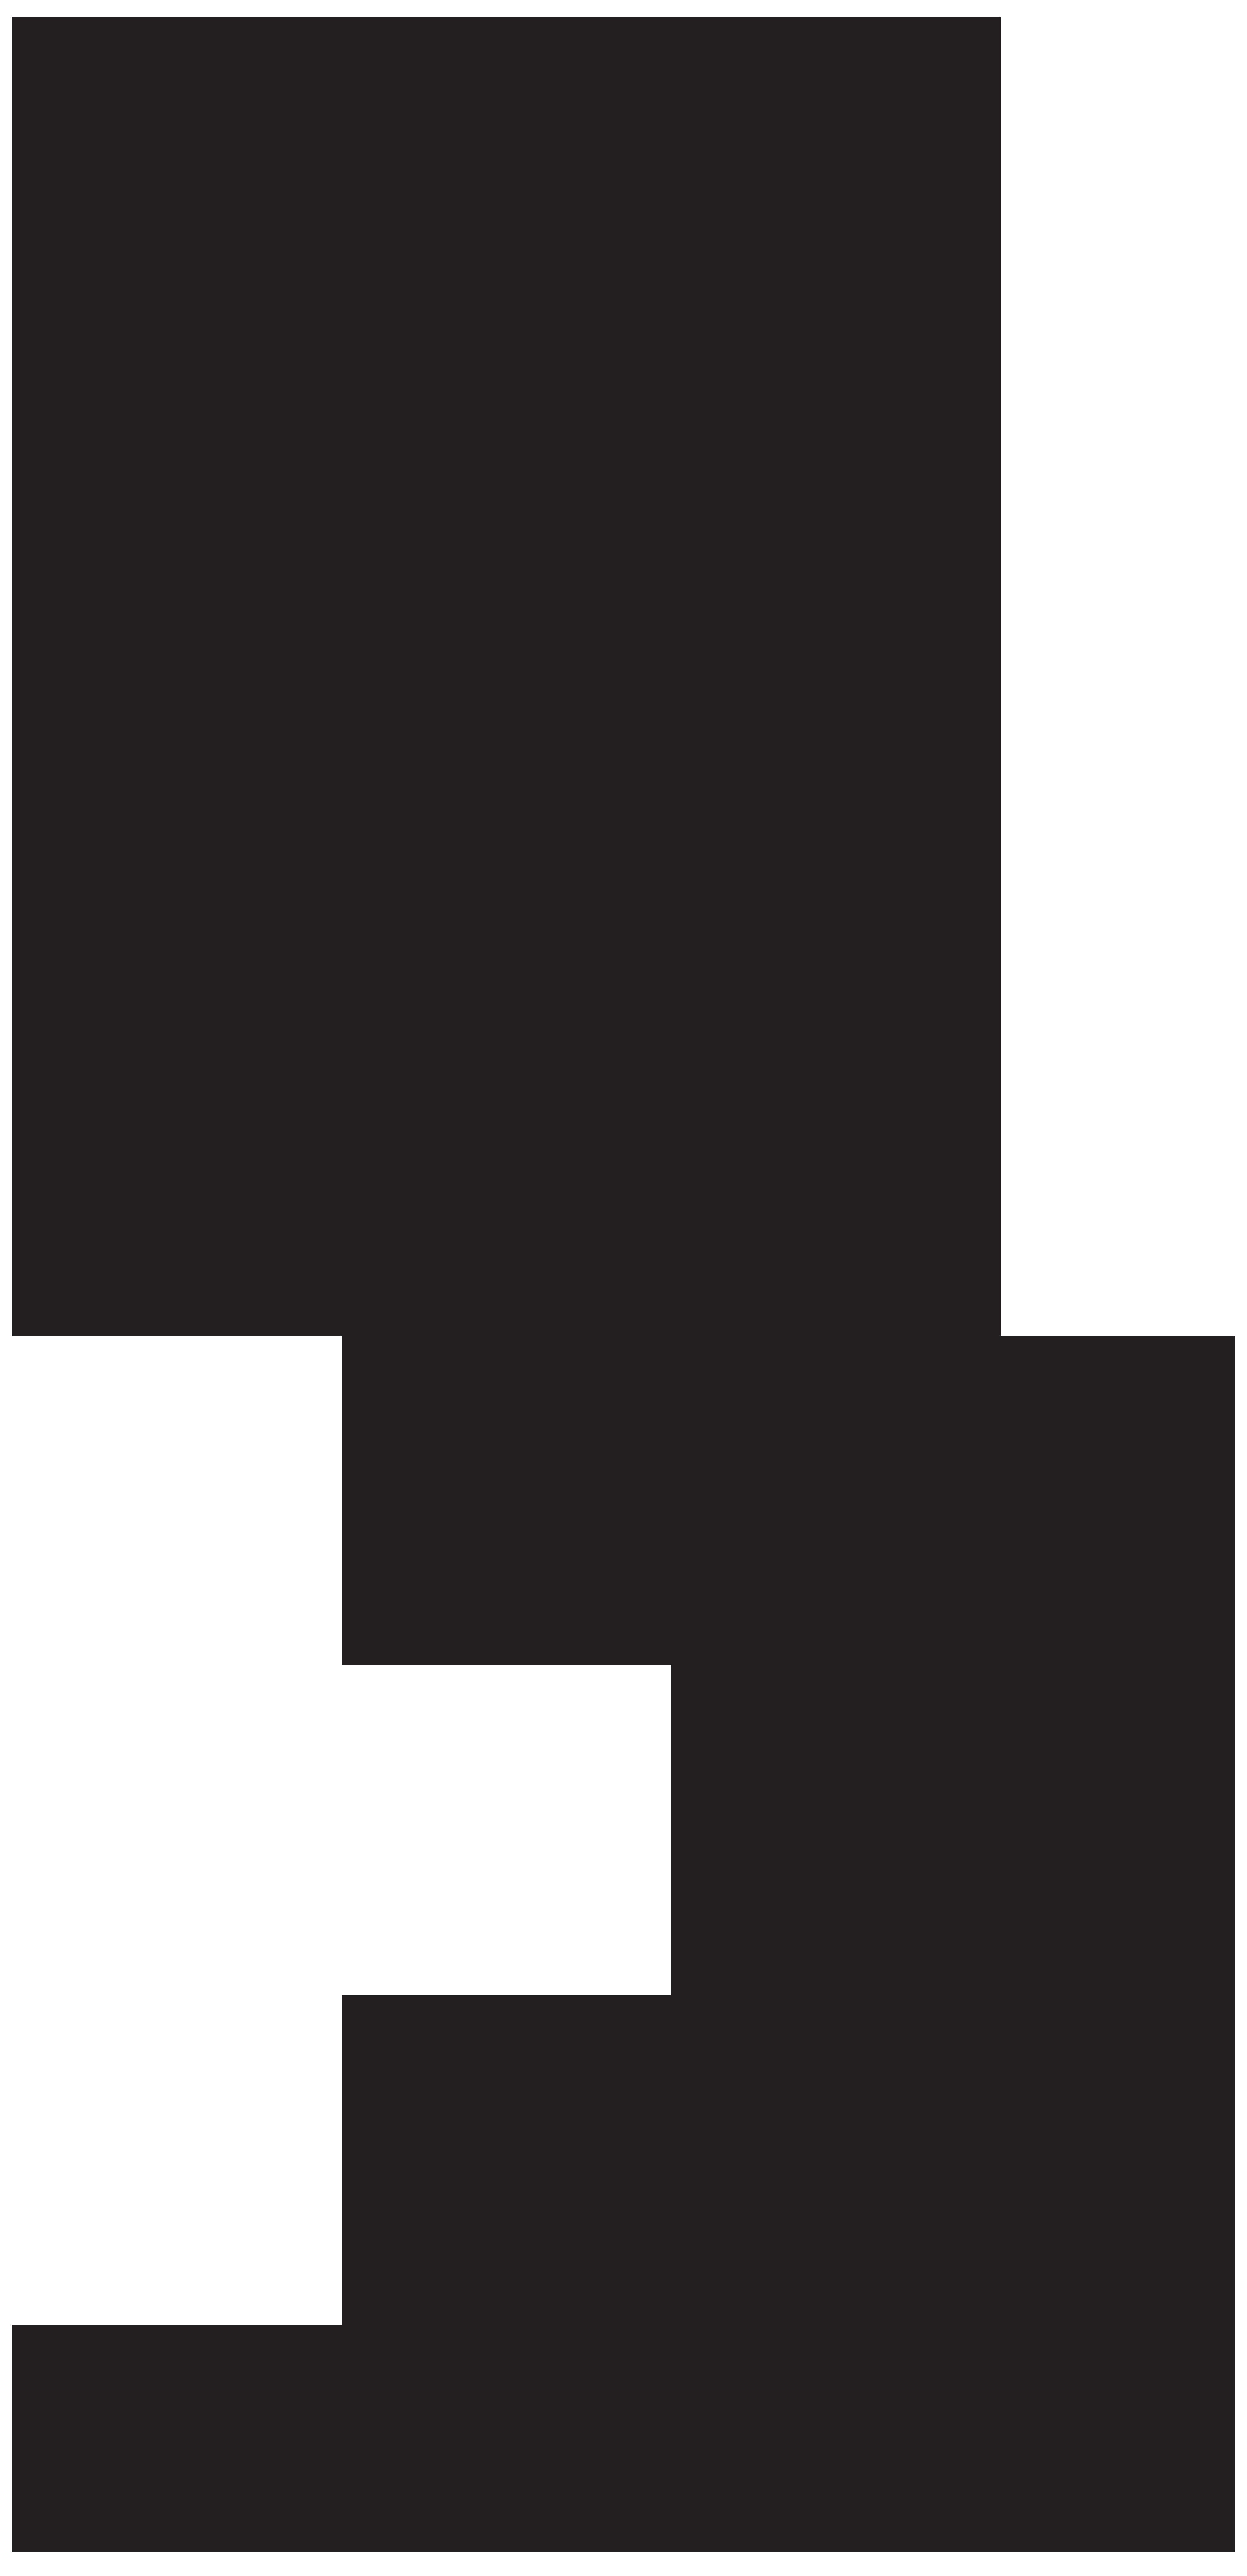 Mermaid Silhouette PNG Clip Art Image.